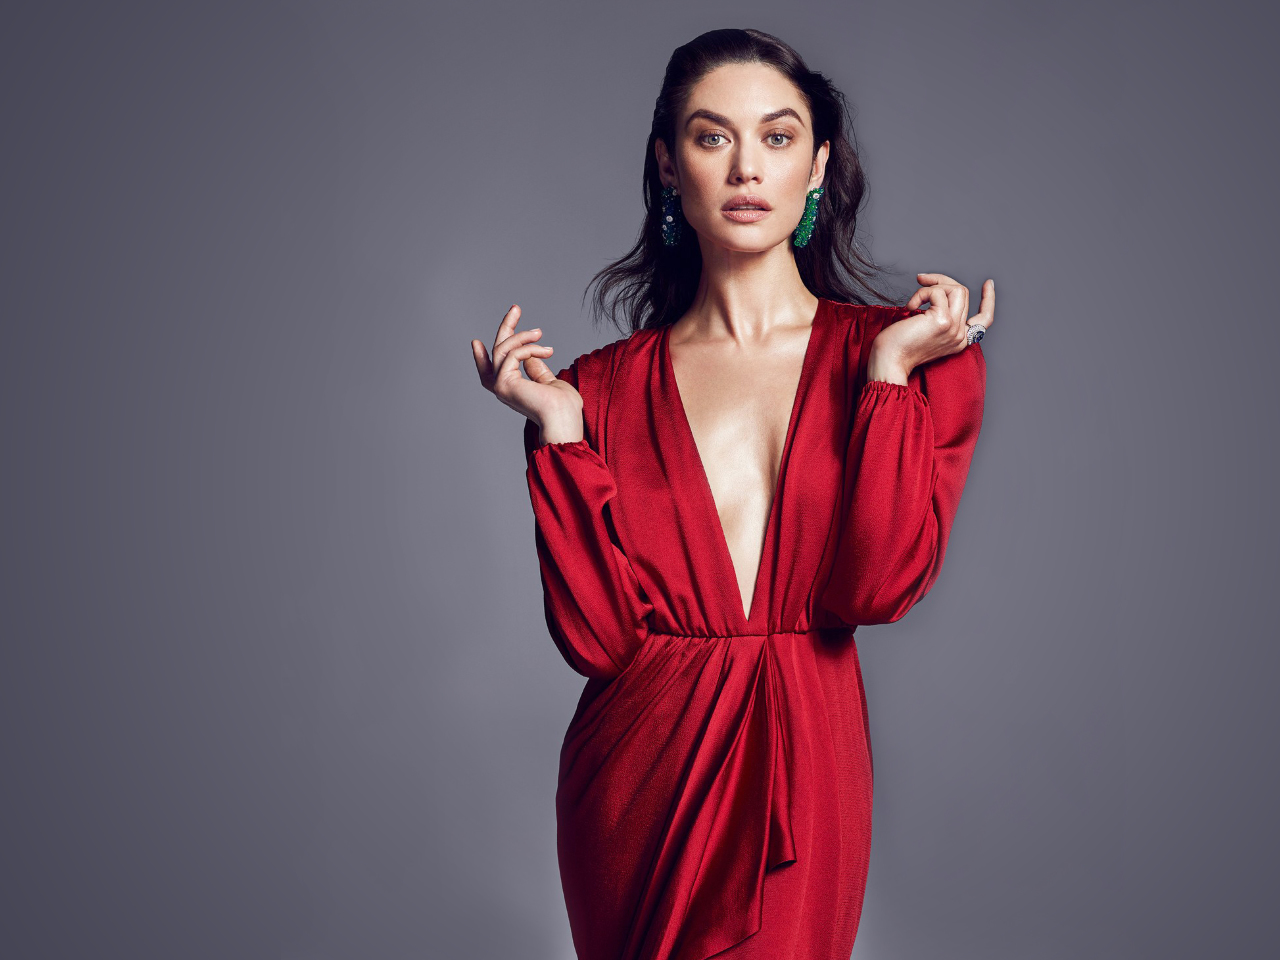 Olga Kurylenko 2018 Full Hd 2k Wallpaper